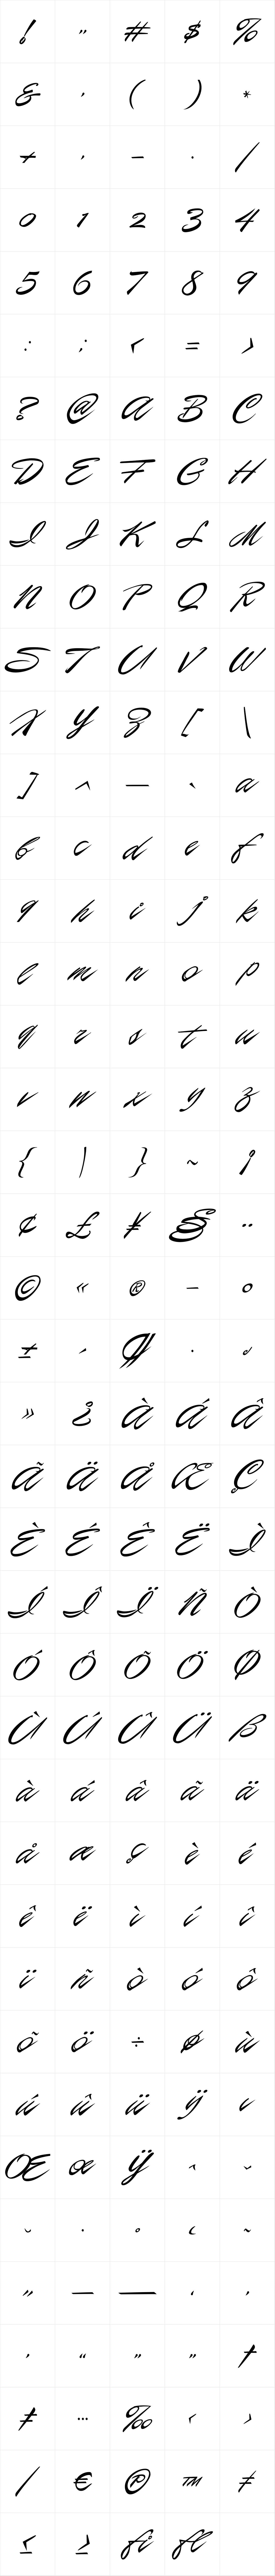 P22 Casual Script Alternate